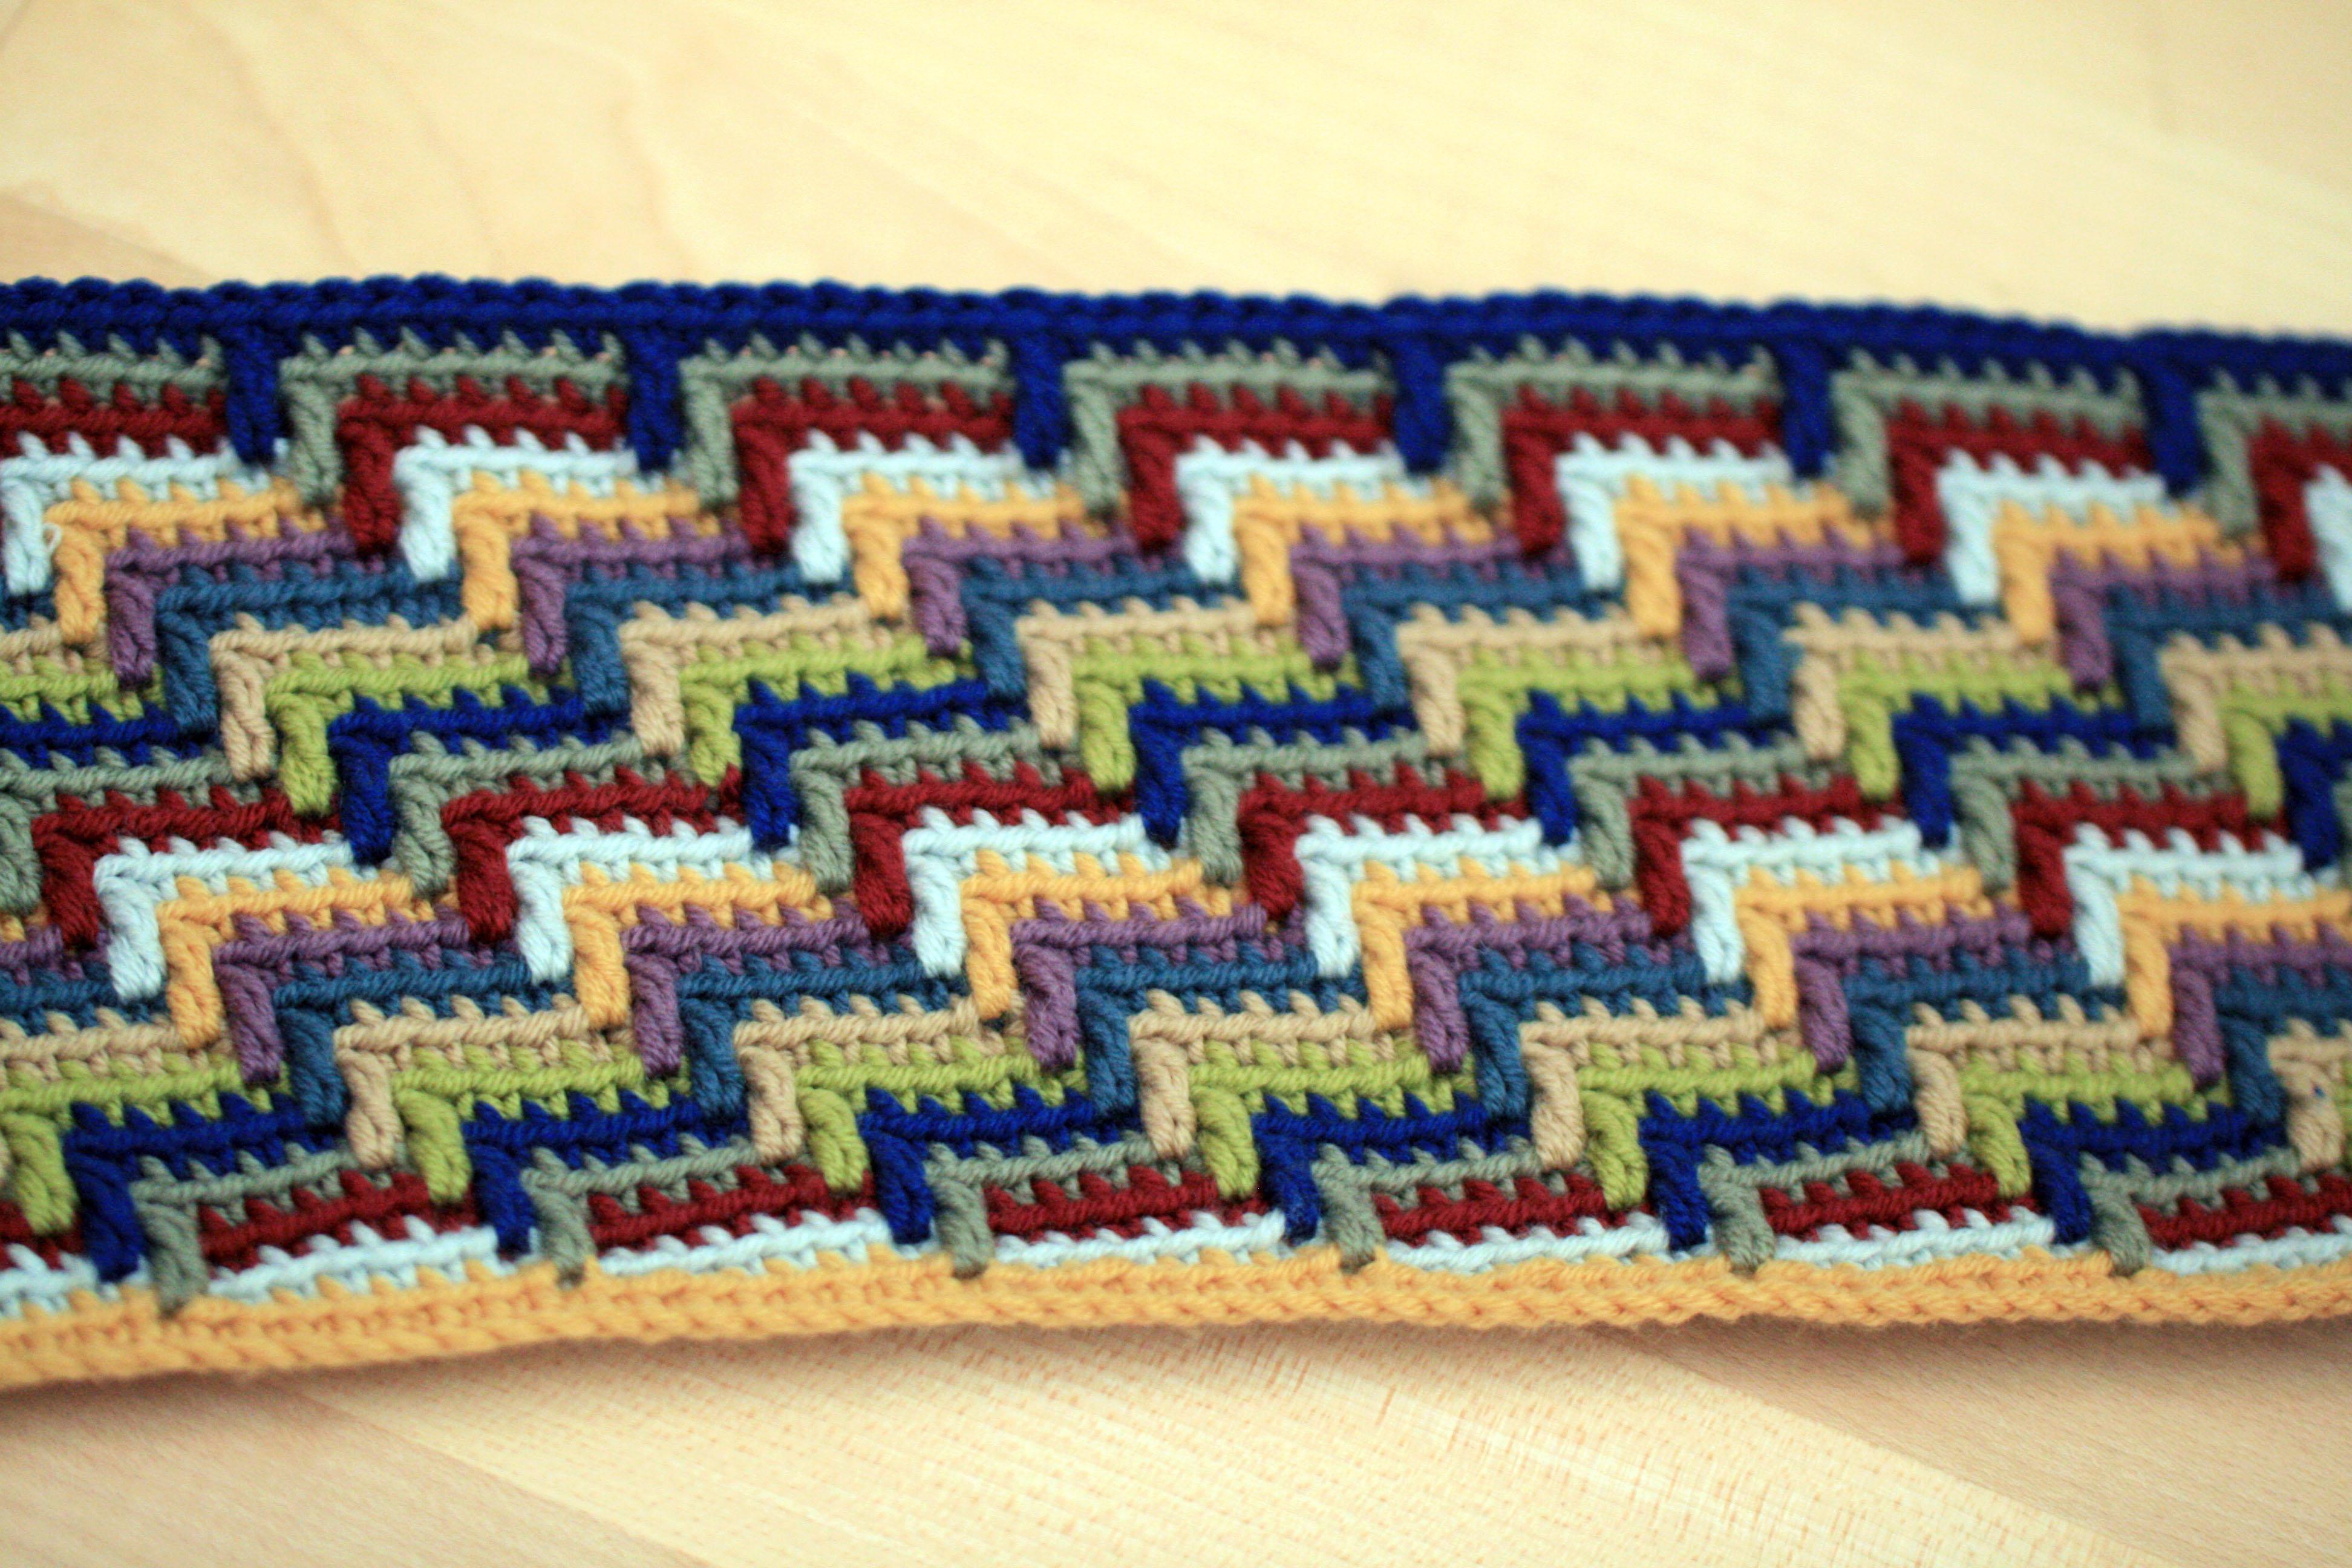 How To Crochet Apache Tears Pattern For Blanket : Apache Tears Free Pattern